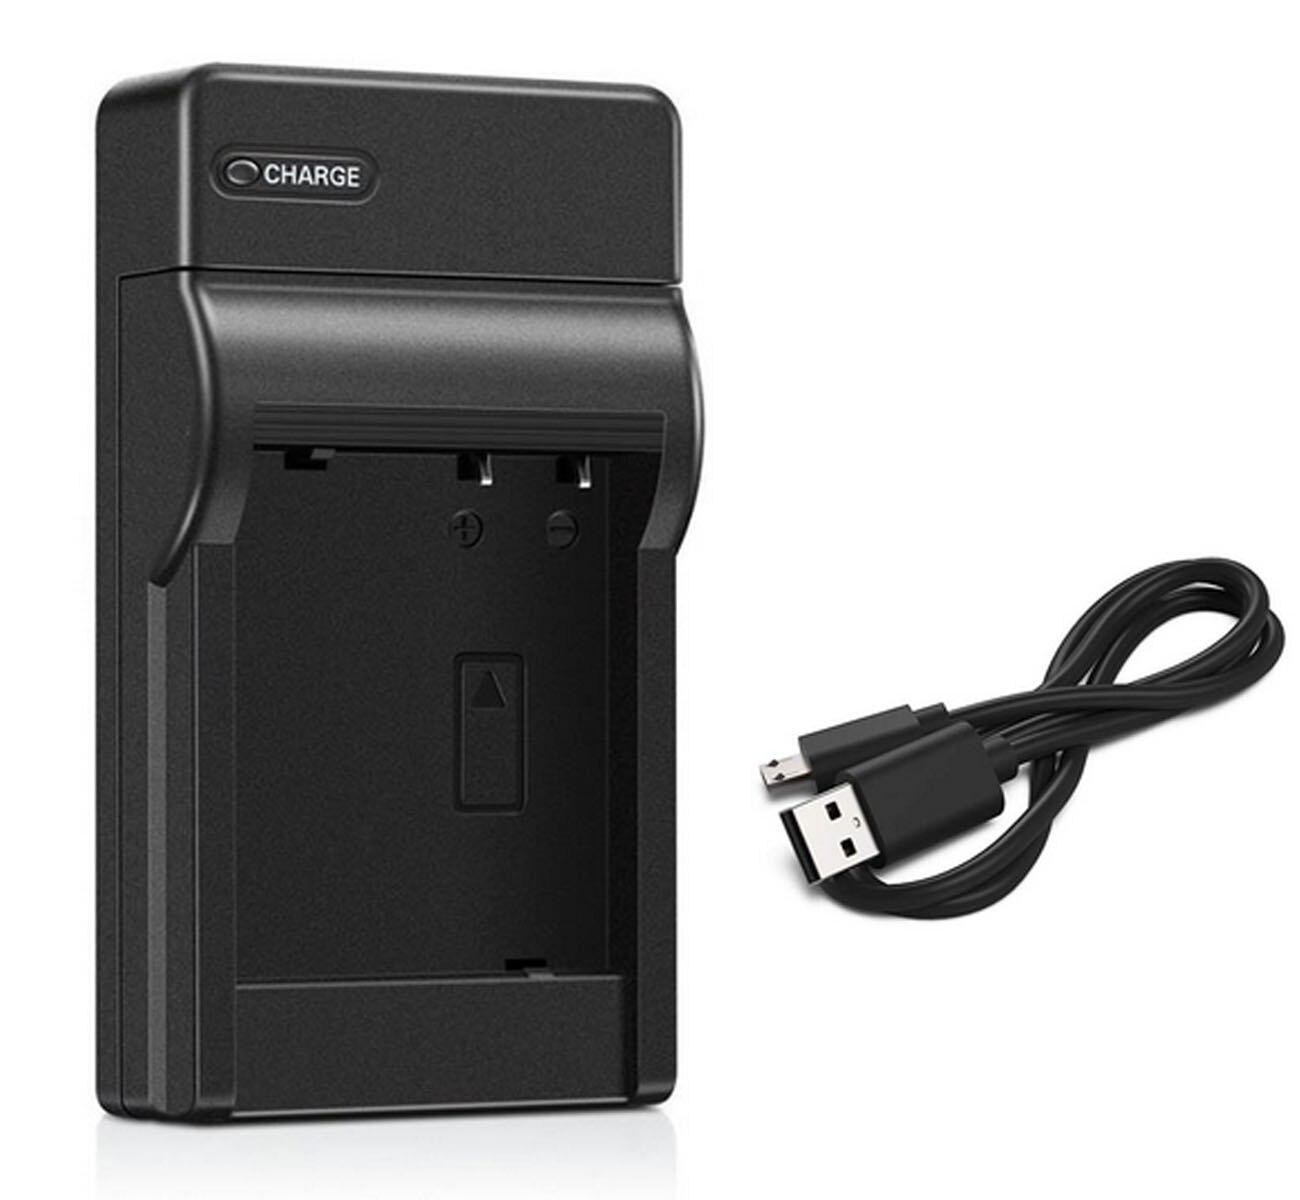 Carregador de bateria para nikon coolpix p7000, p7100, p7700, câmera digital p7800